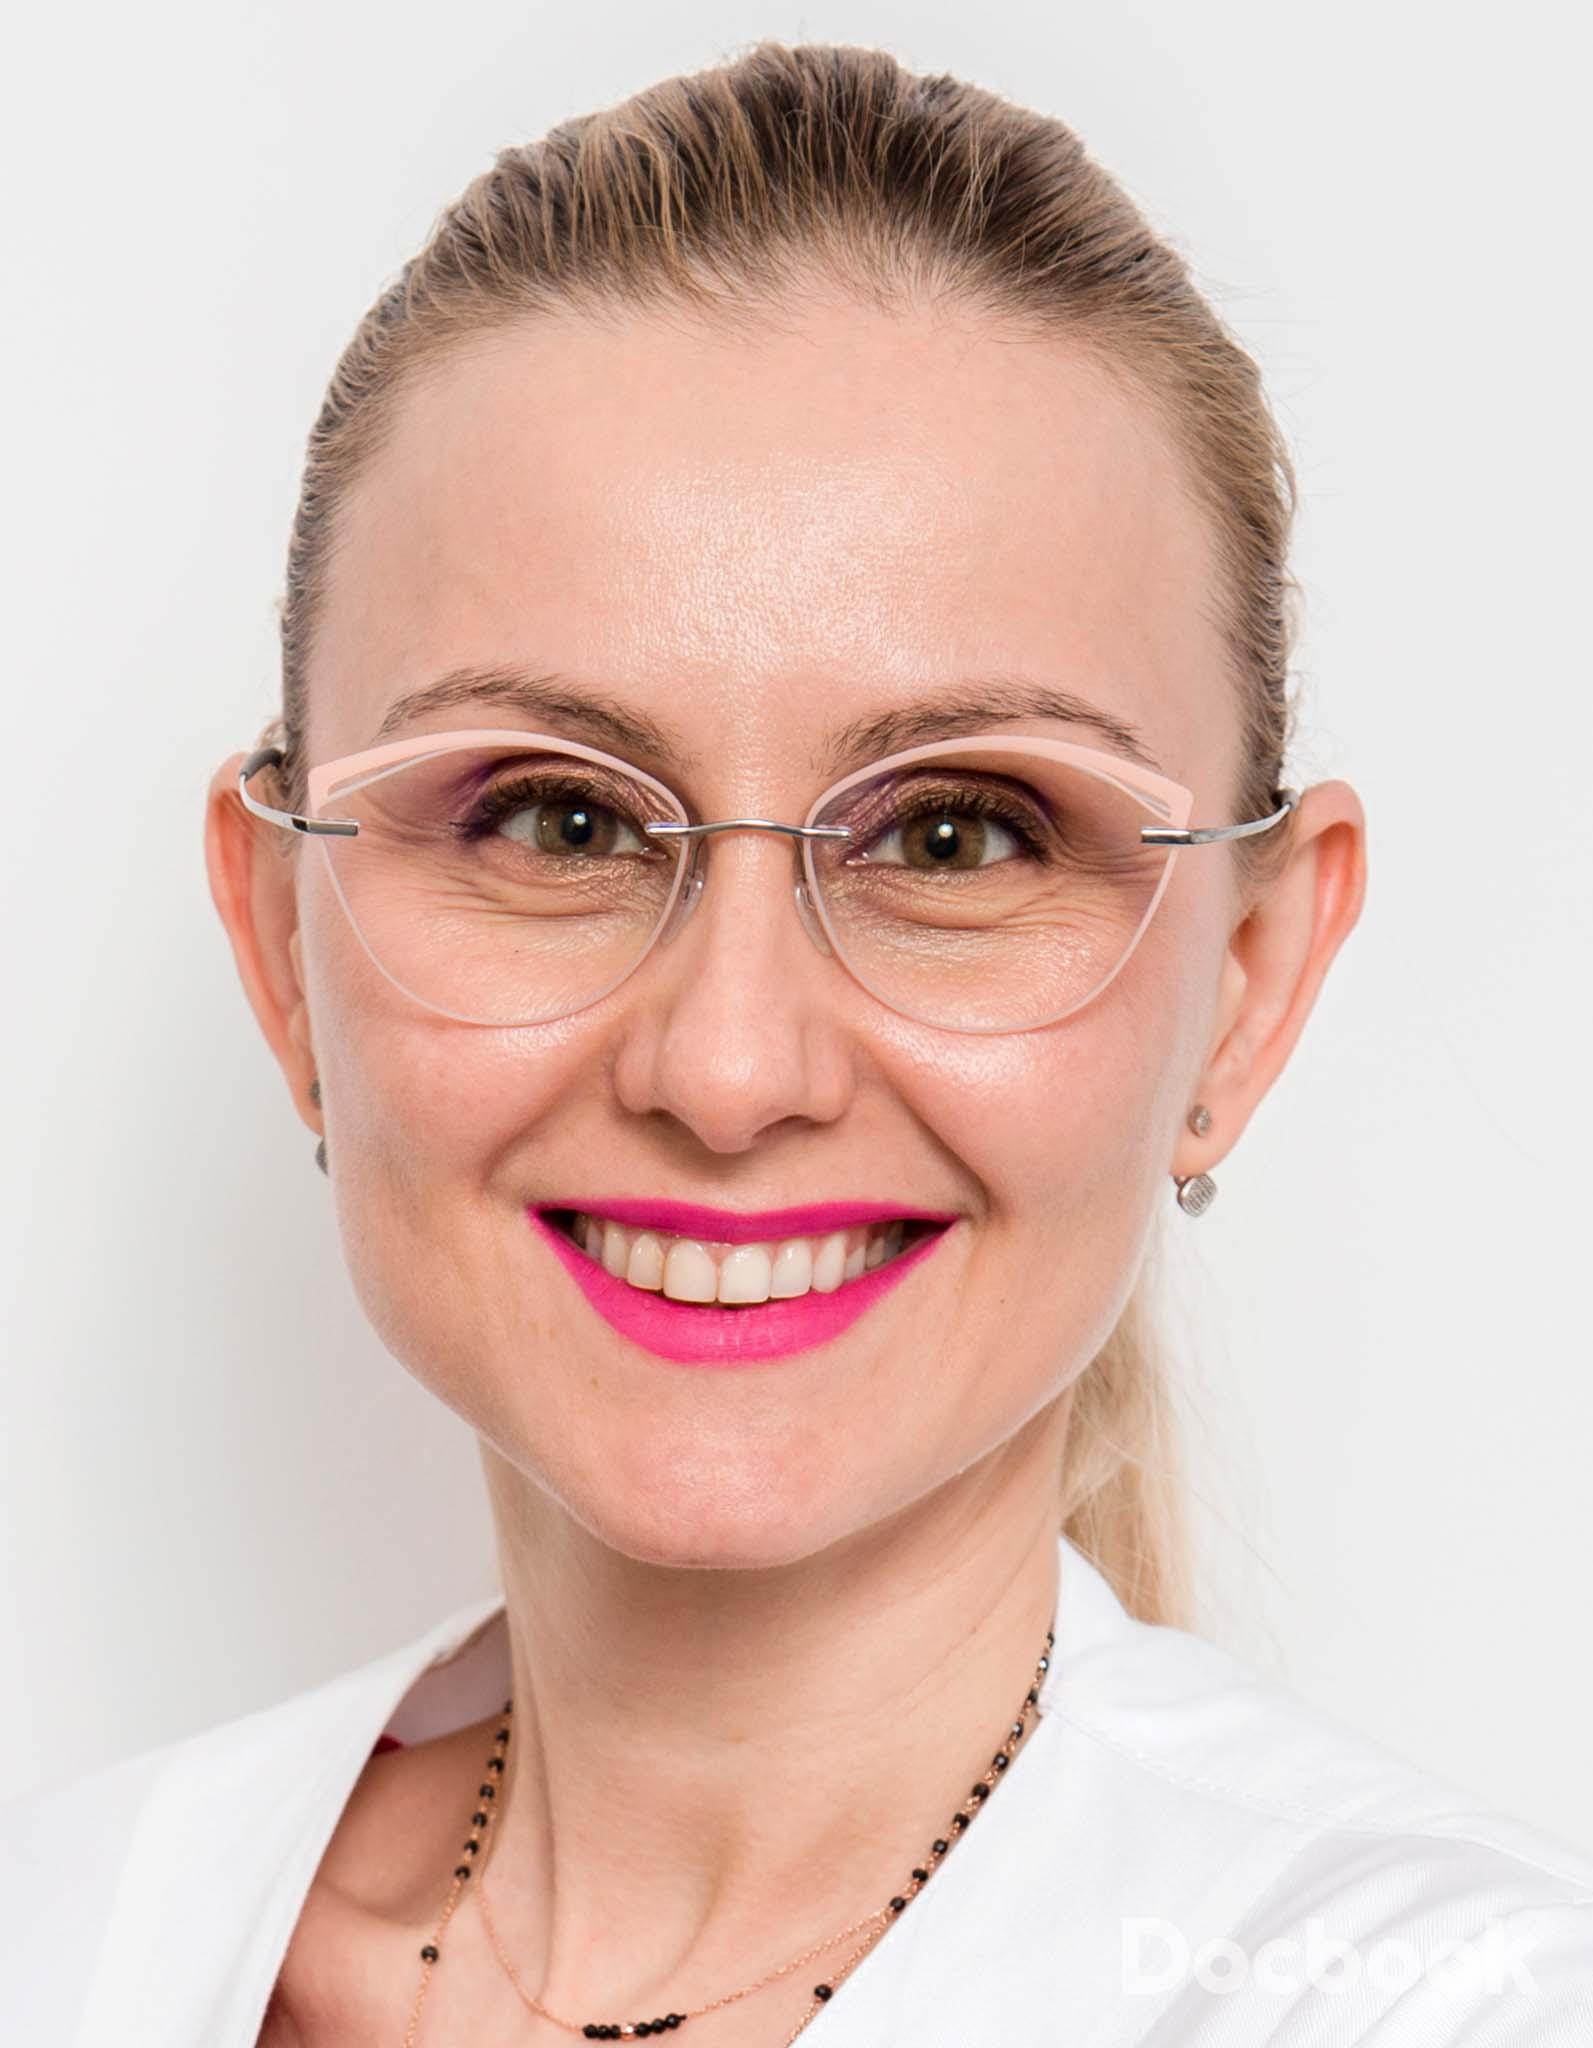 Dr. Amalia Anghel